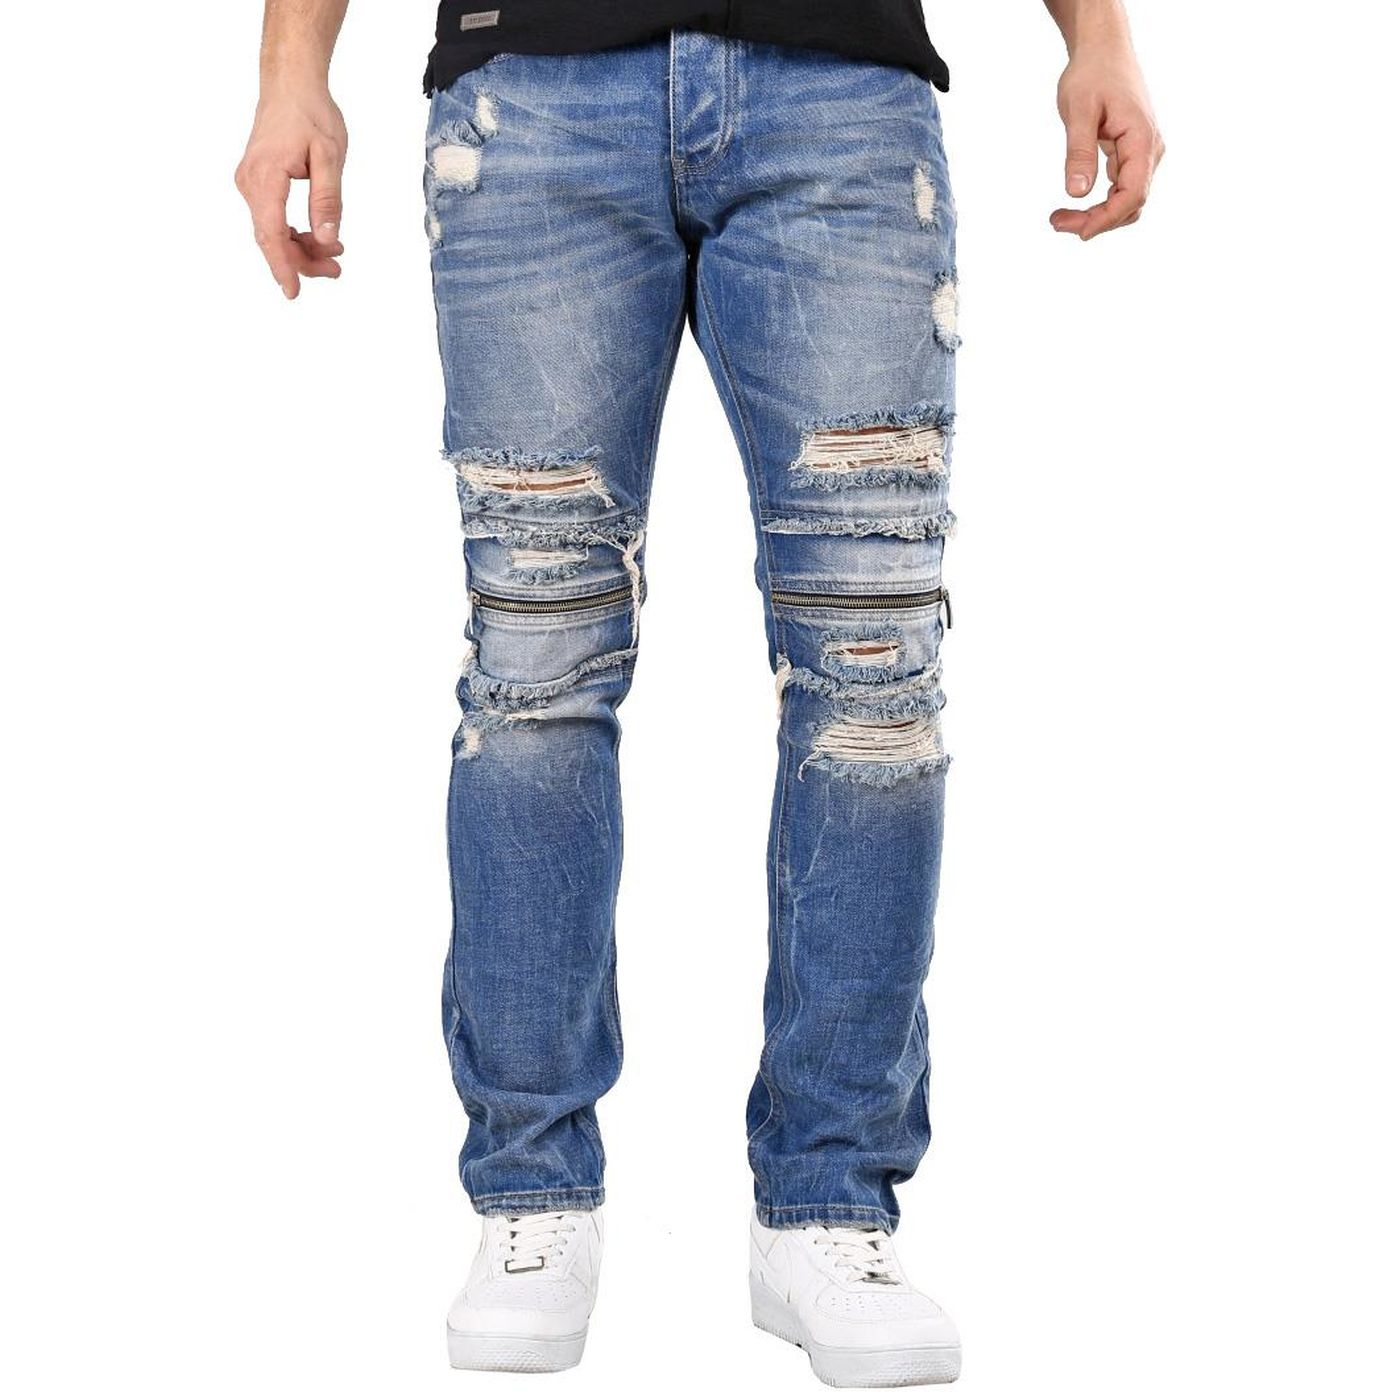 Red Bridge Herren Jeans Hose Zipper Destroyed Blau Straight Fit Used